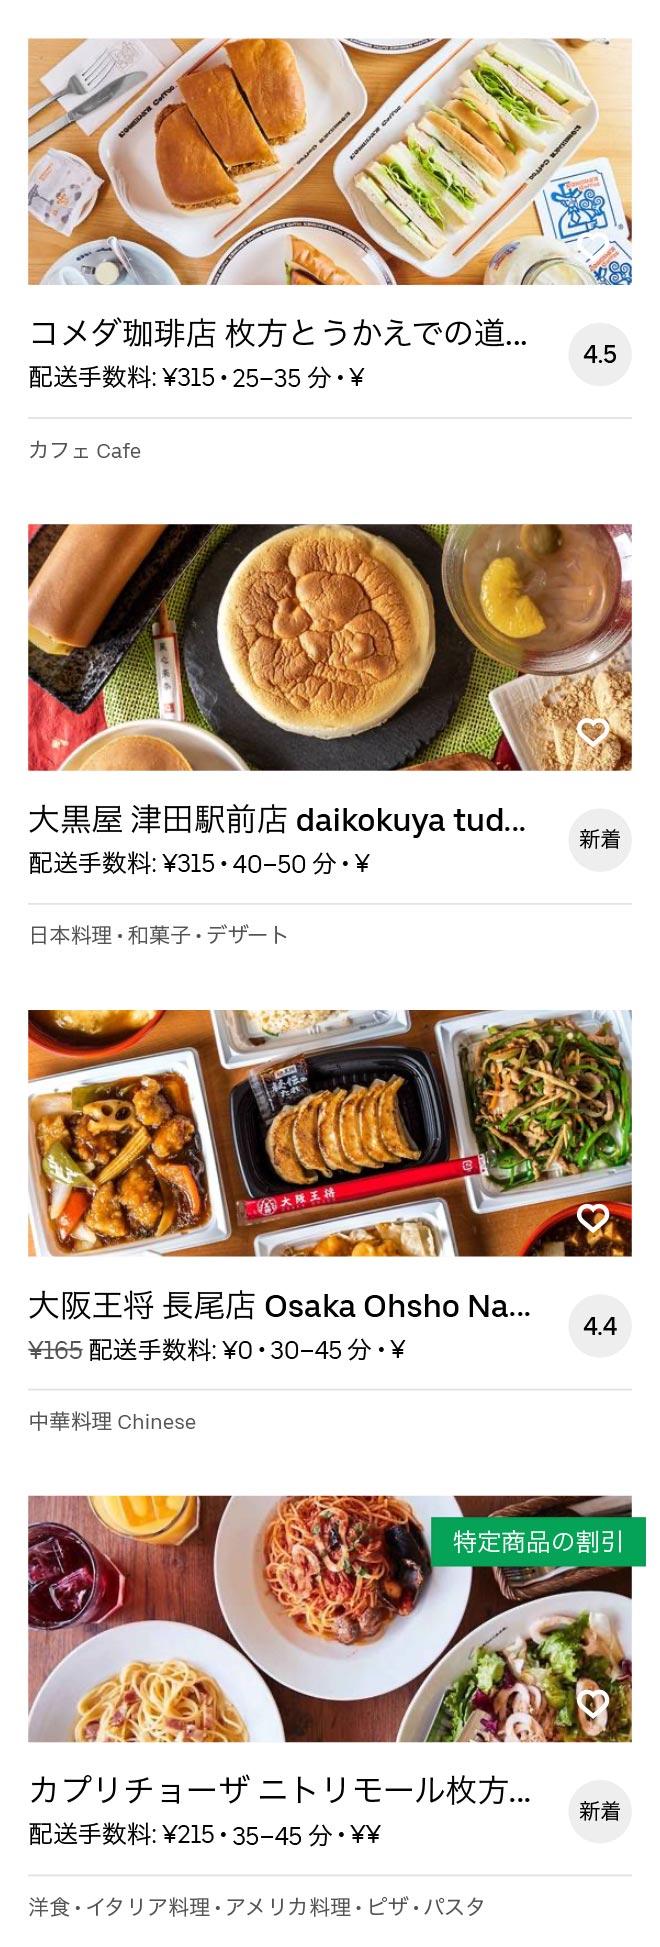 Nagao menu 2010 09